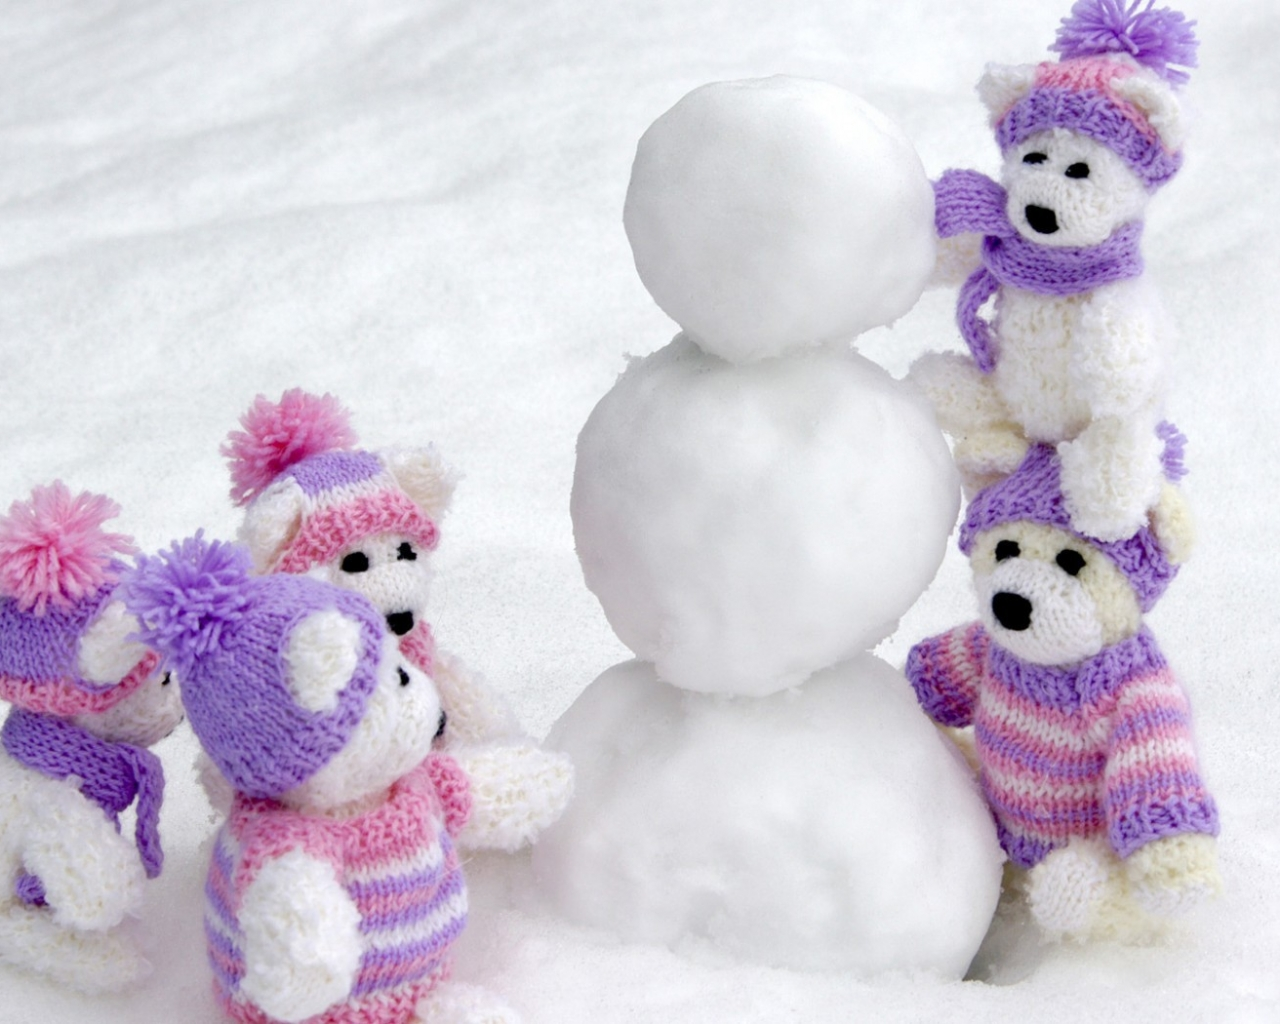 Peluches en la nieve - 1280x1024